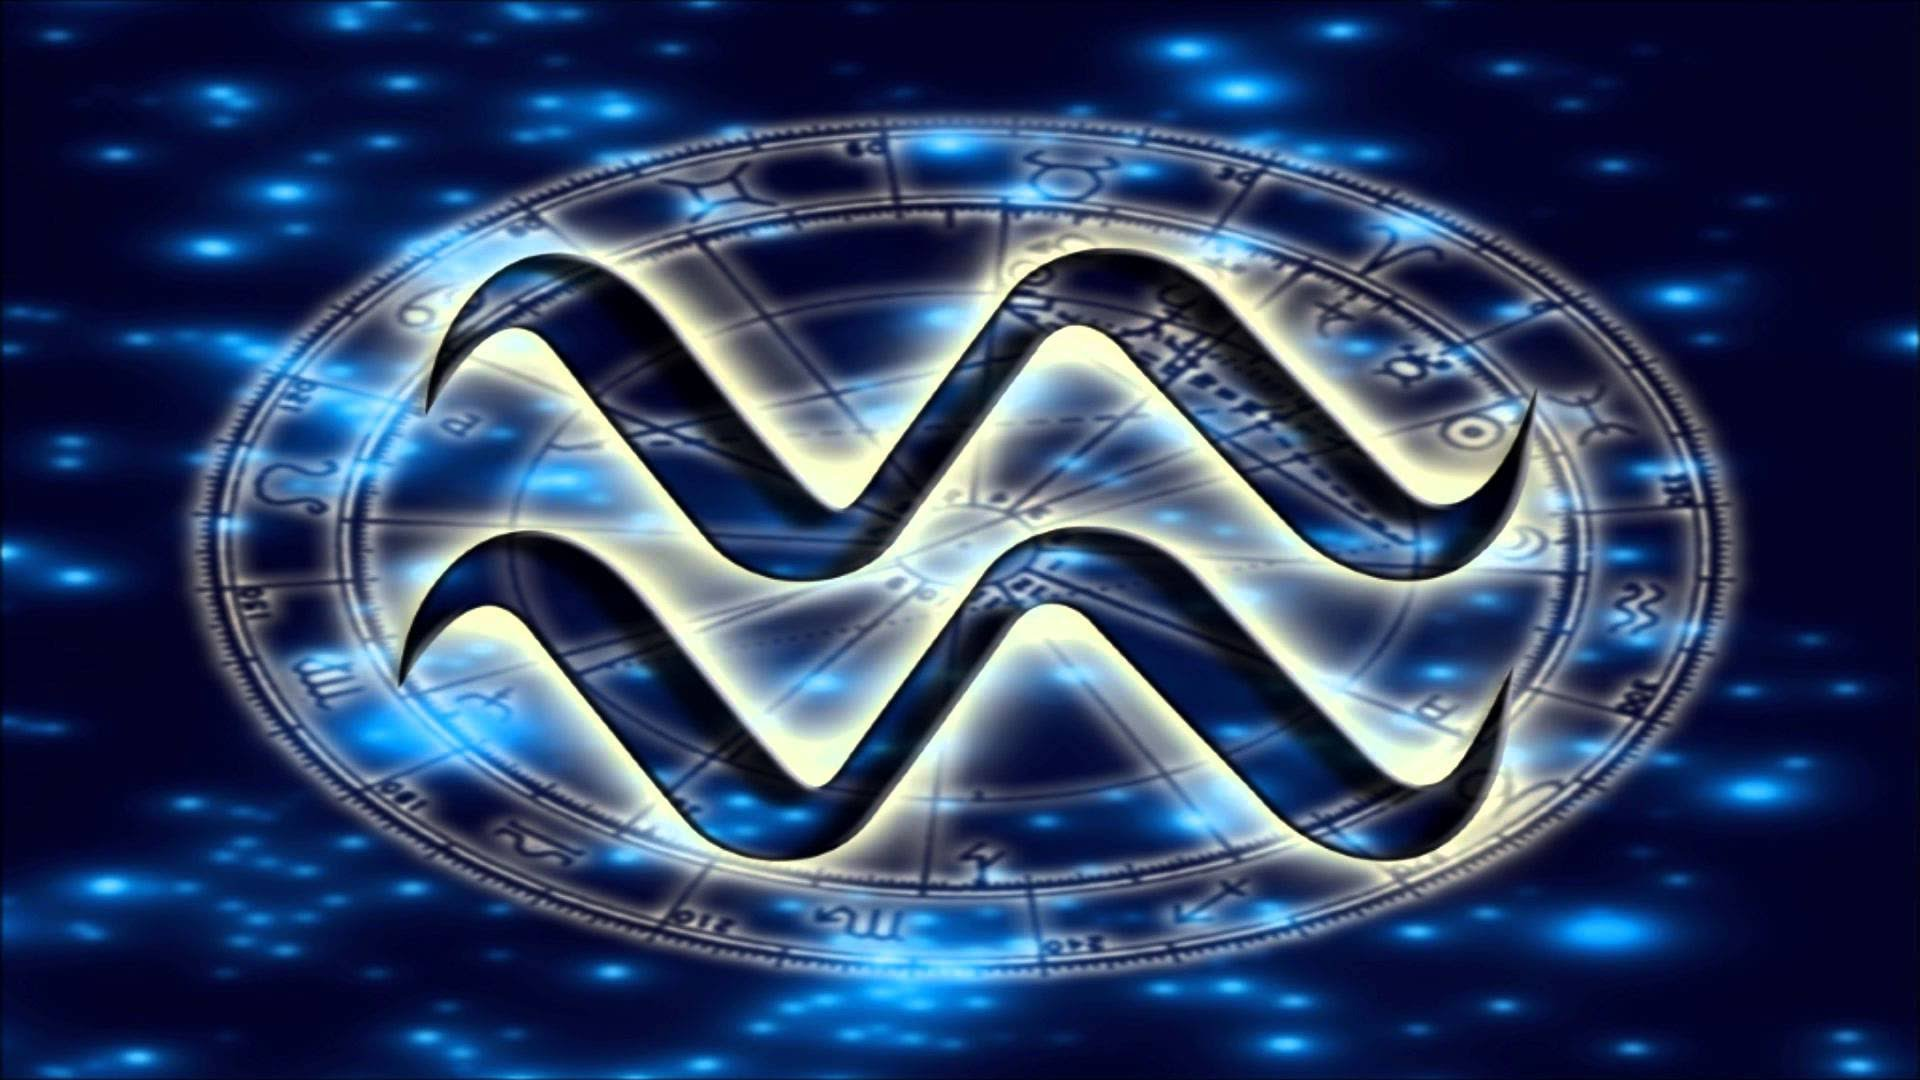 astrologia del signo acuario